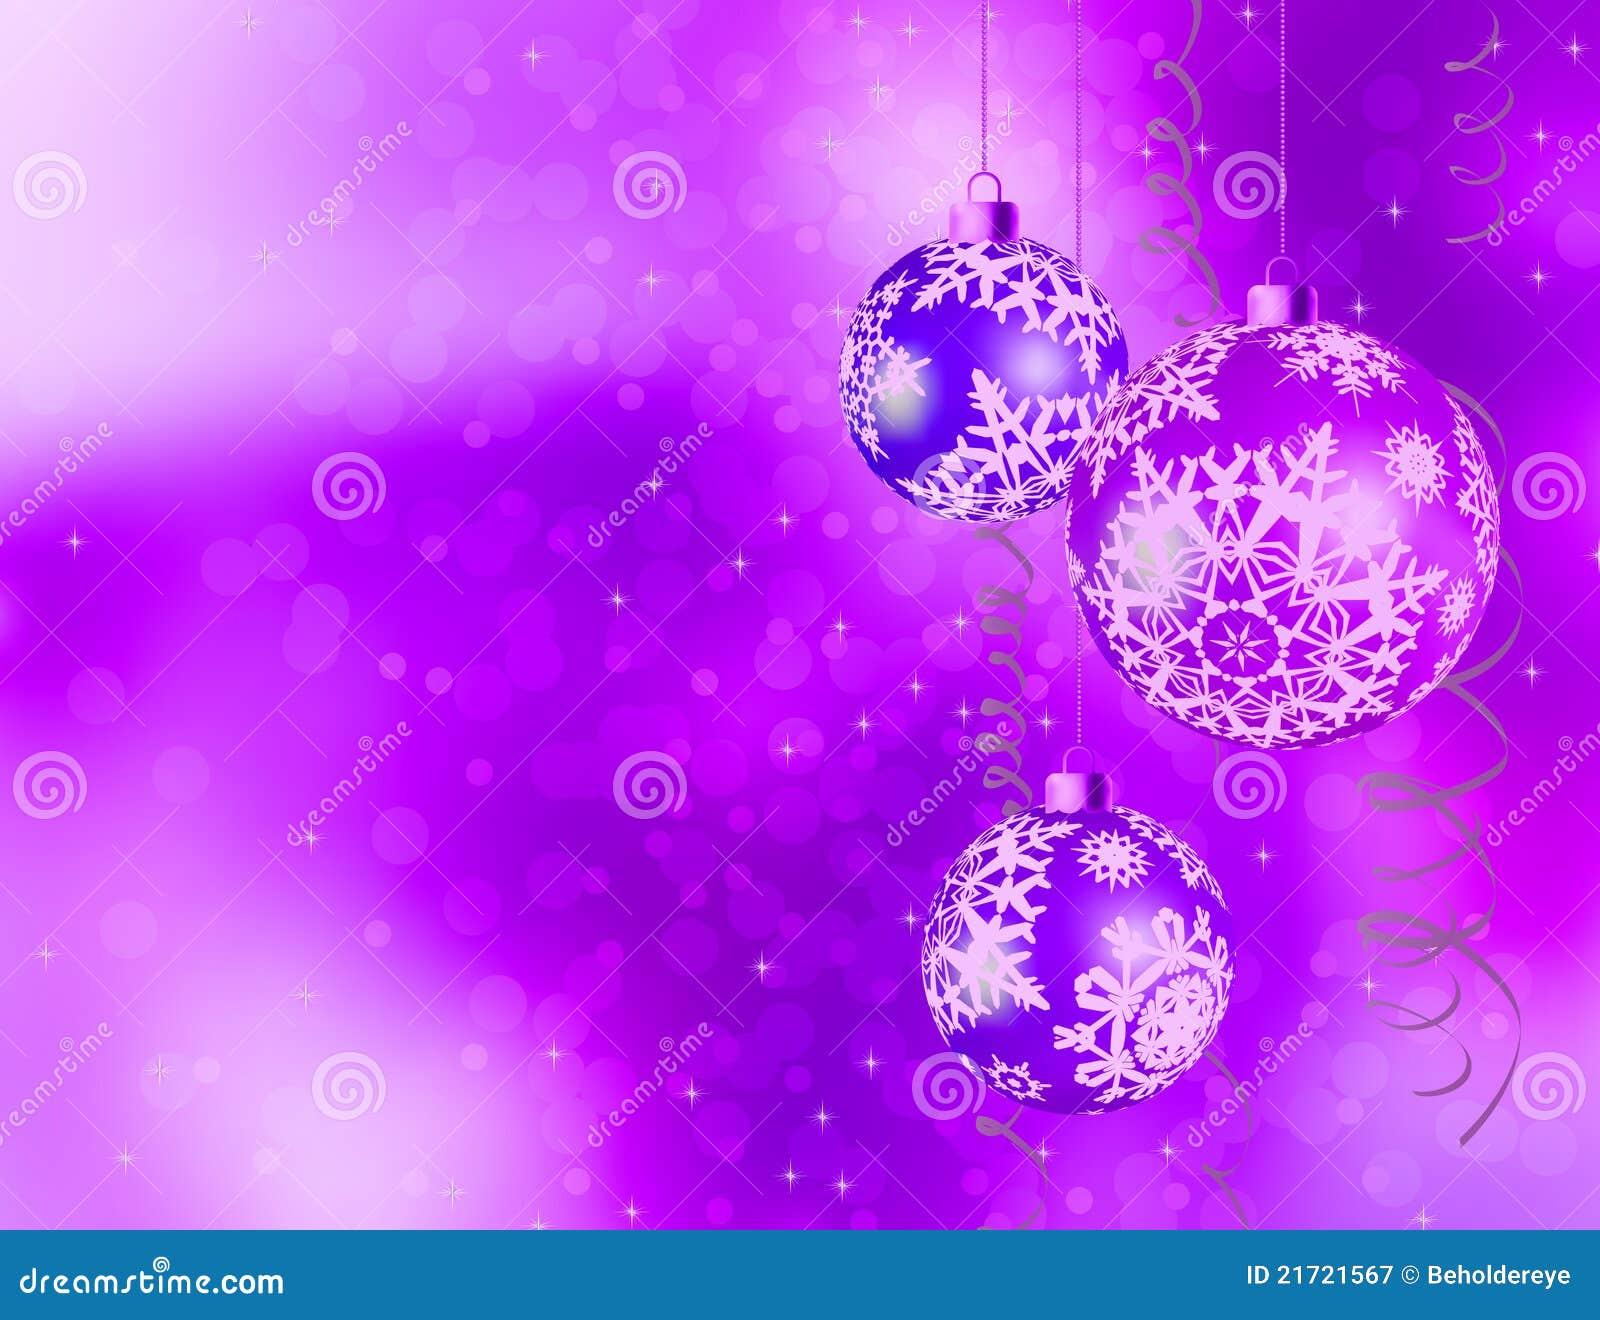 Purple Shiny Christmas Background. EPS 8 Royalty Free Stock ...